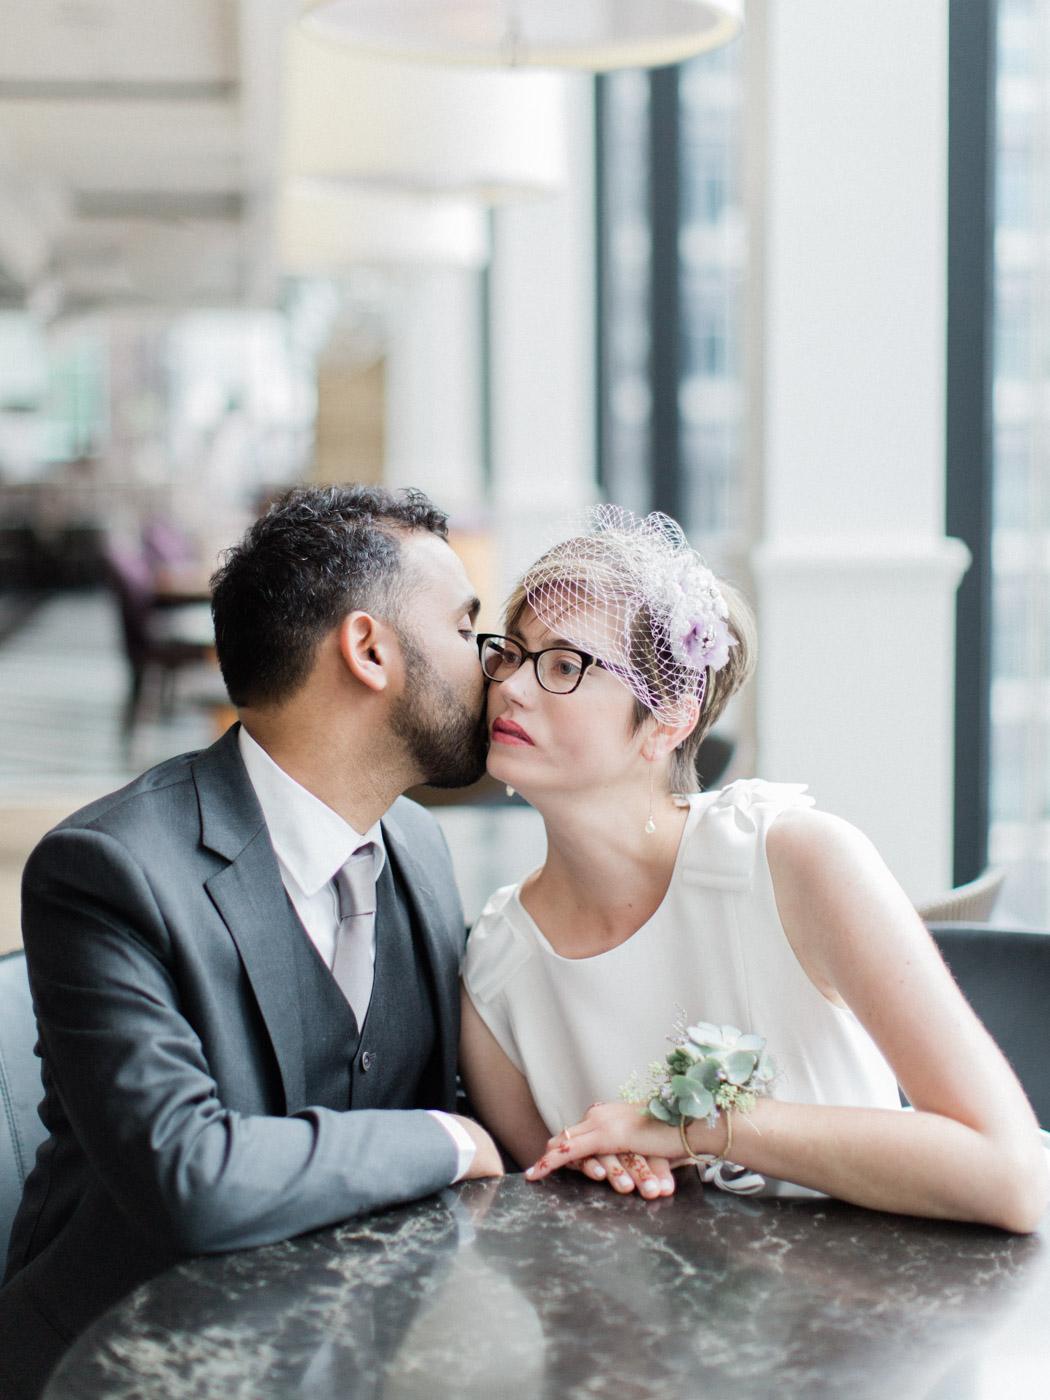 Toronto-wedding-photographer-intimate-restaurant-elopement-chase-oyster-downtown3.jpg